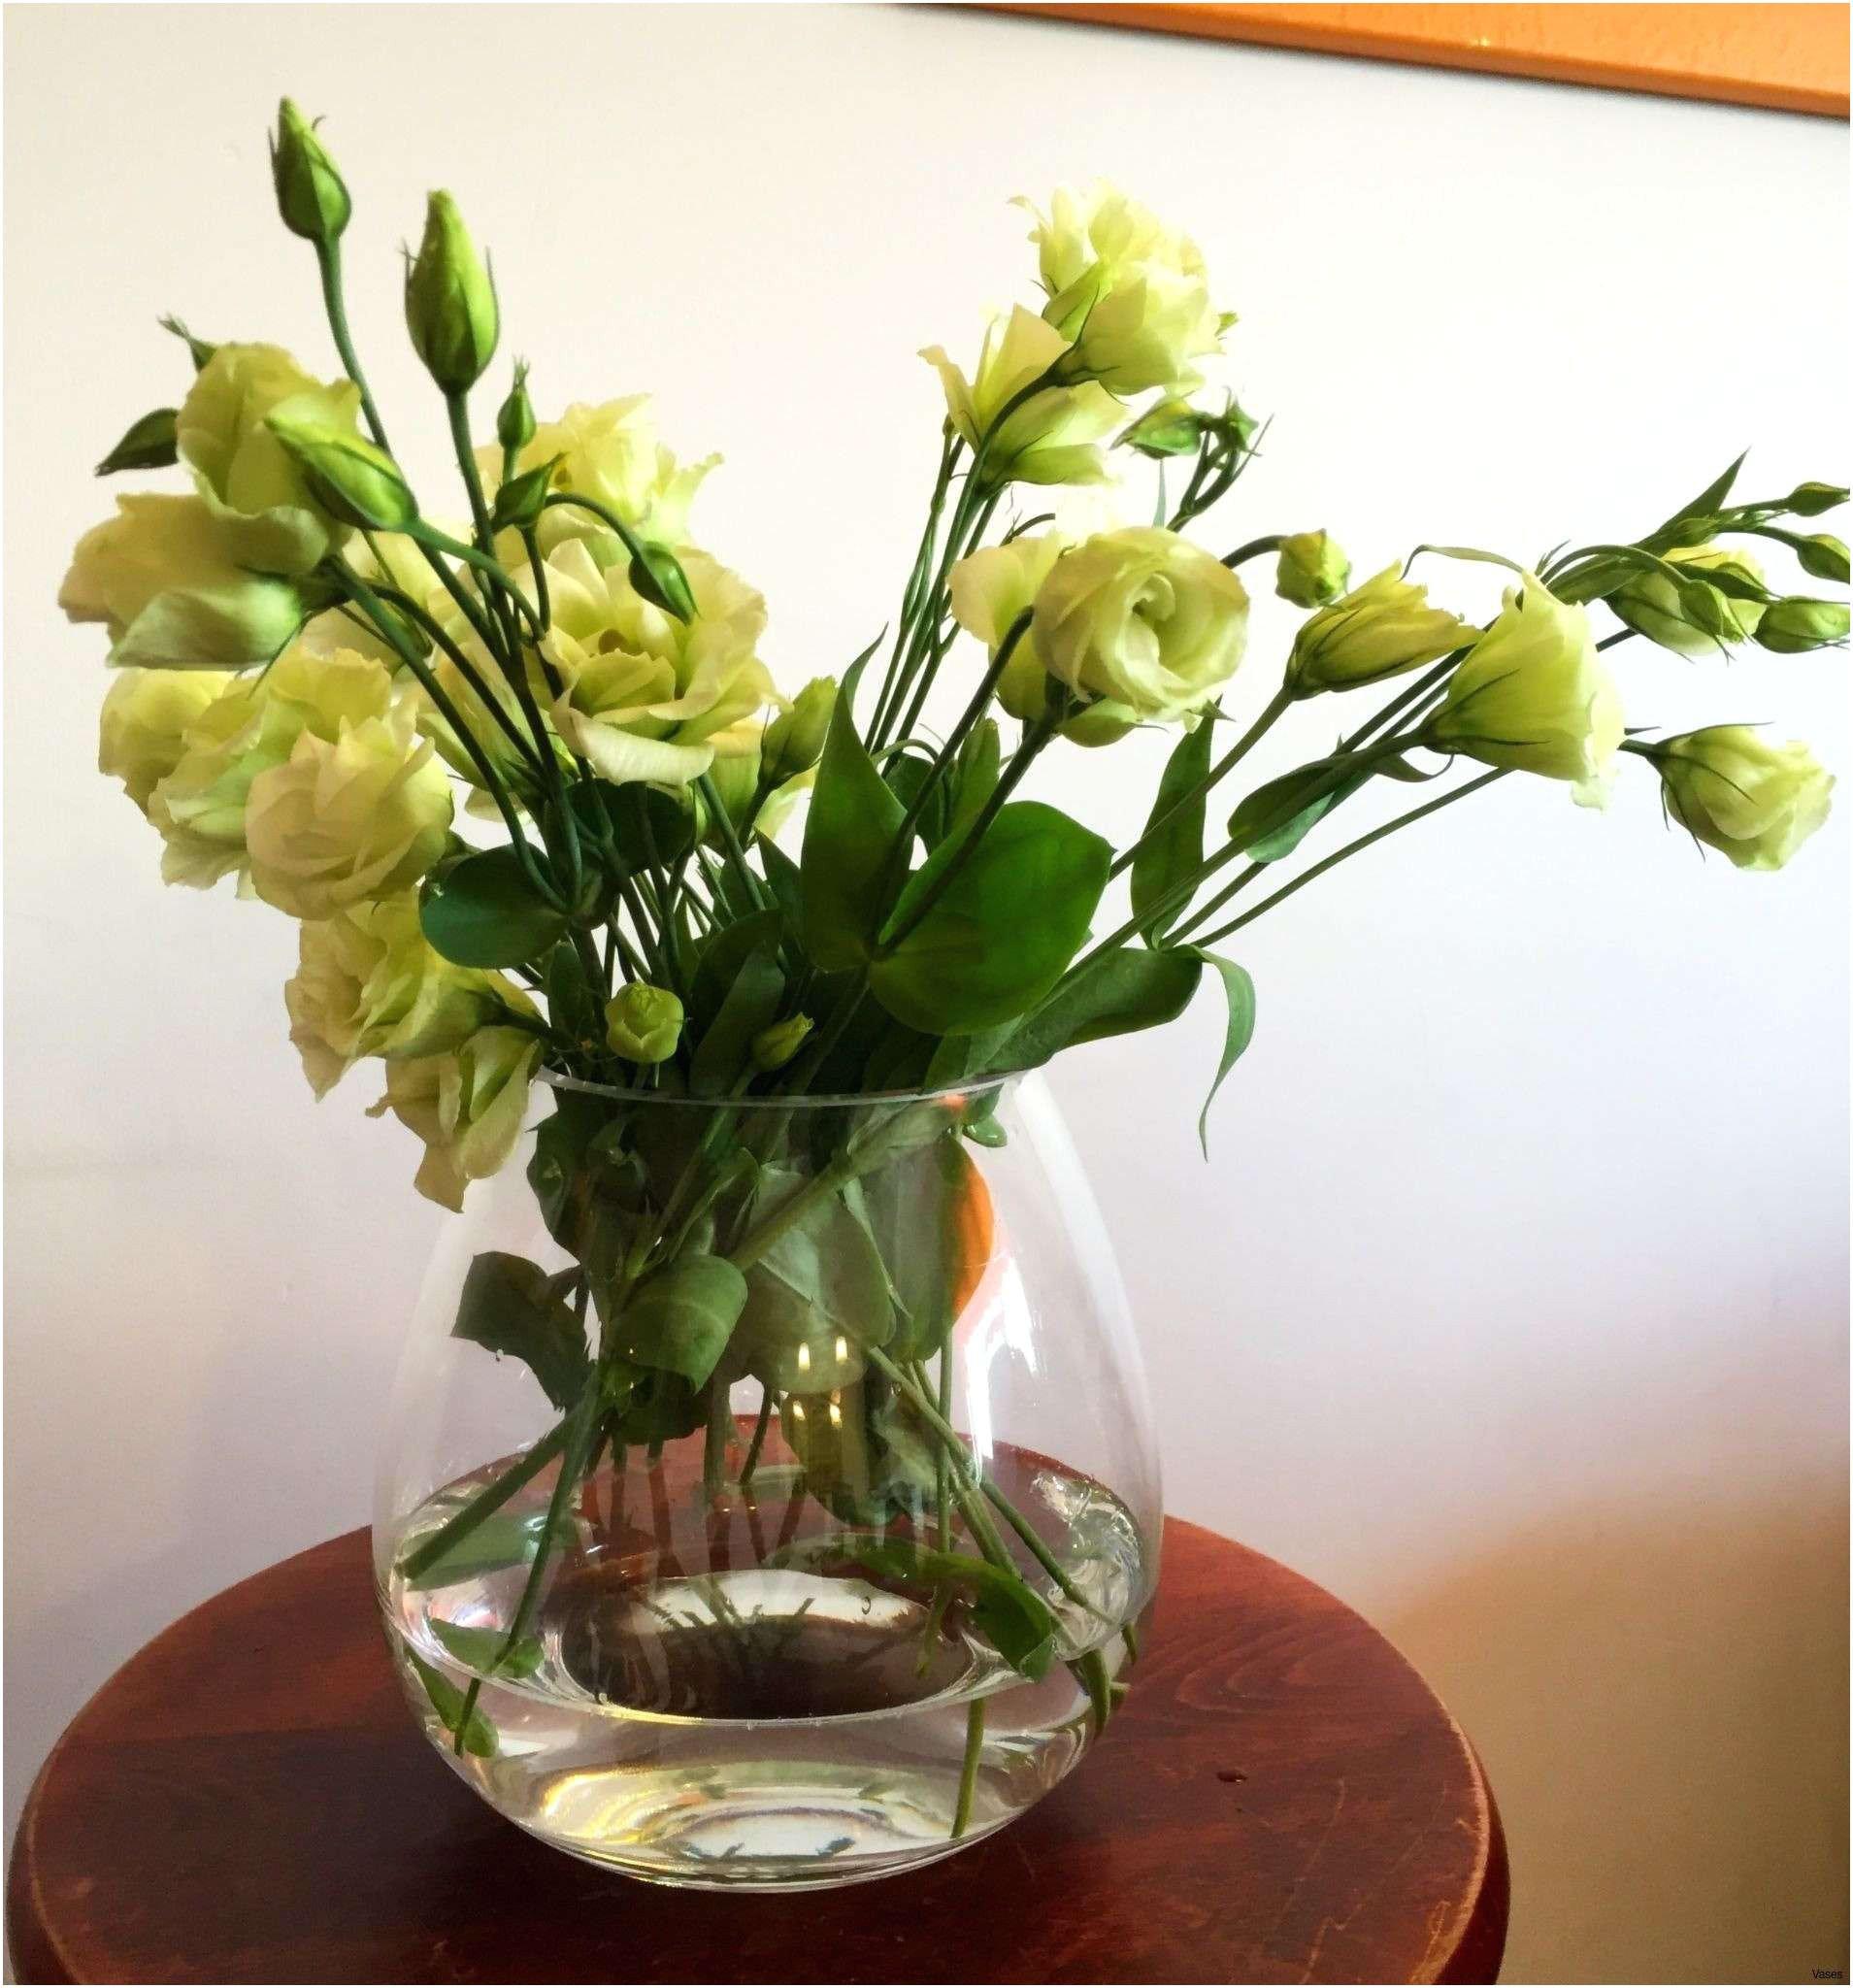 handmade flower vase of green glass vase images tiger food phenomenal flower vase table 04h in green glass vase images tiger food phenomenal flower vase table 04h vases tablei 0d clipart